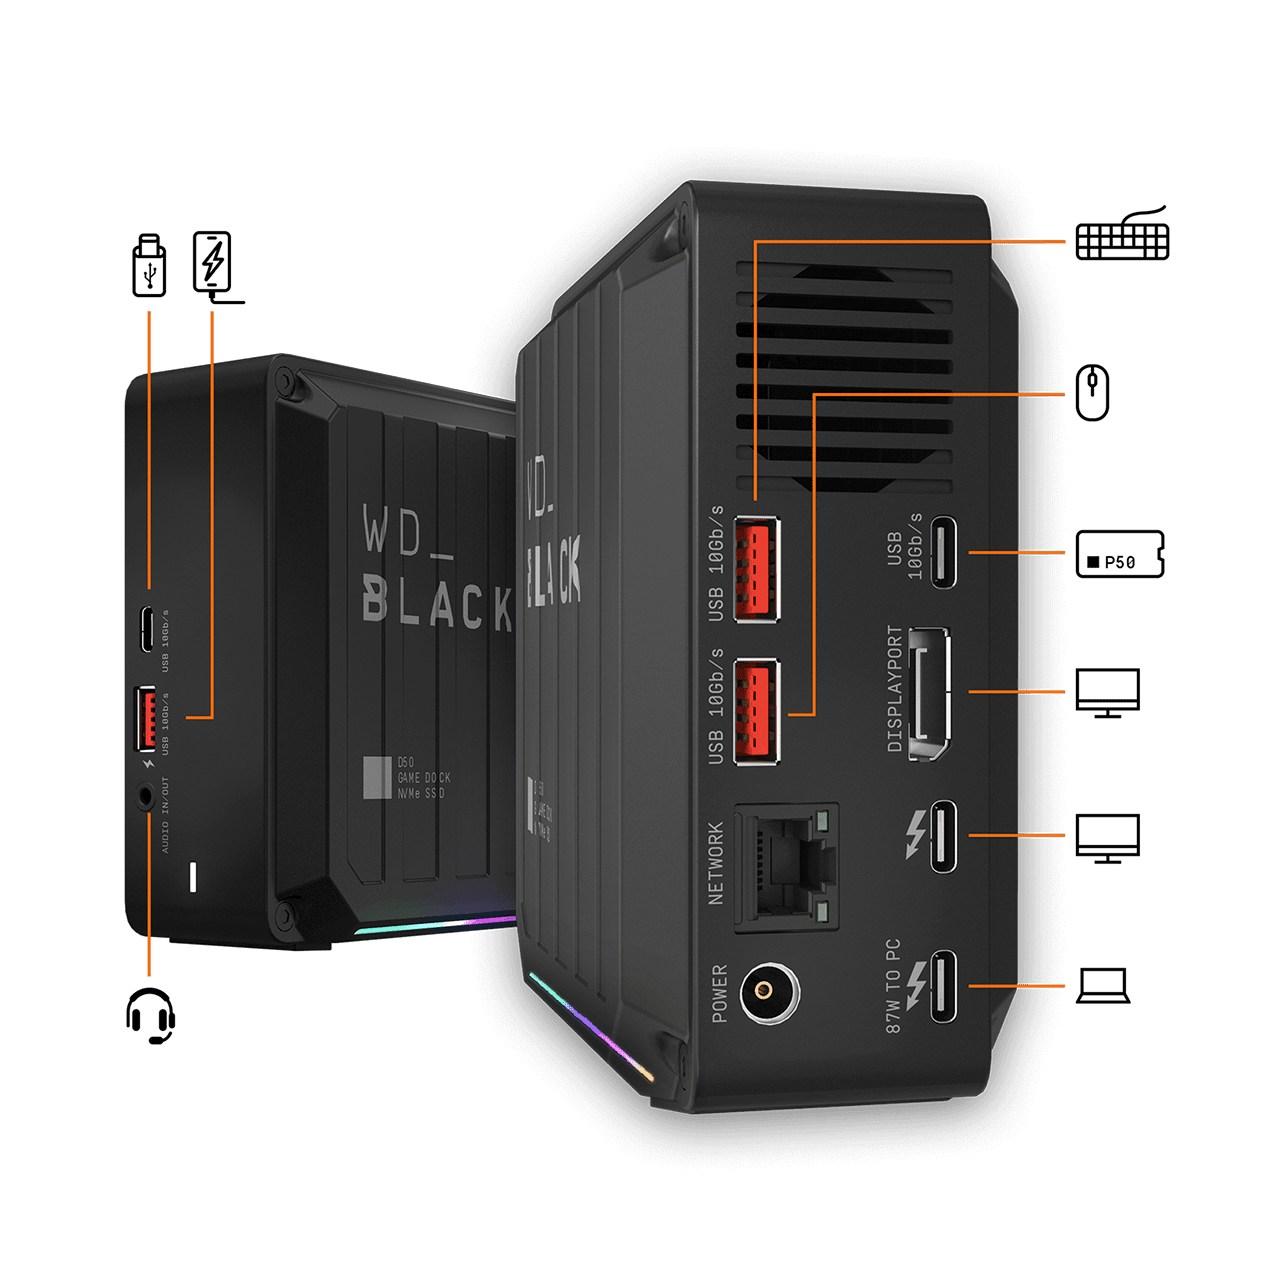 WD_Black NVMe SSD-Produkte (2020)